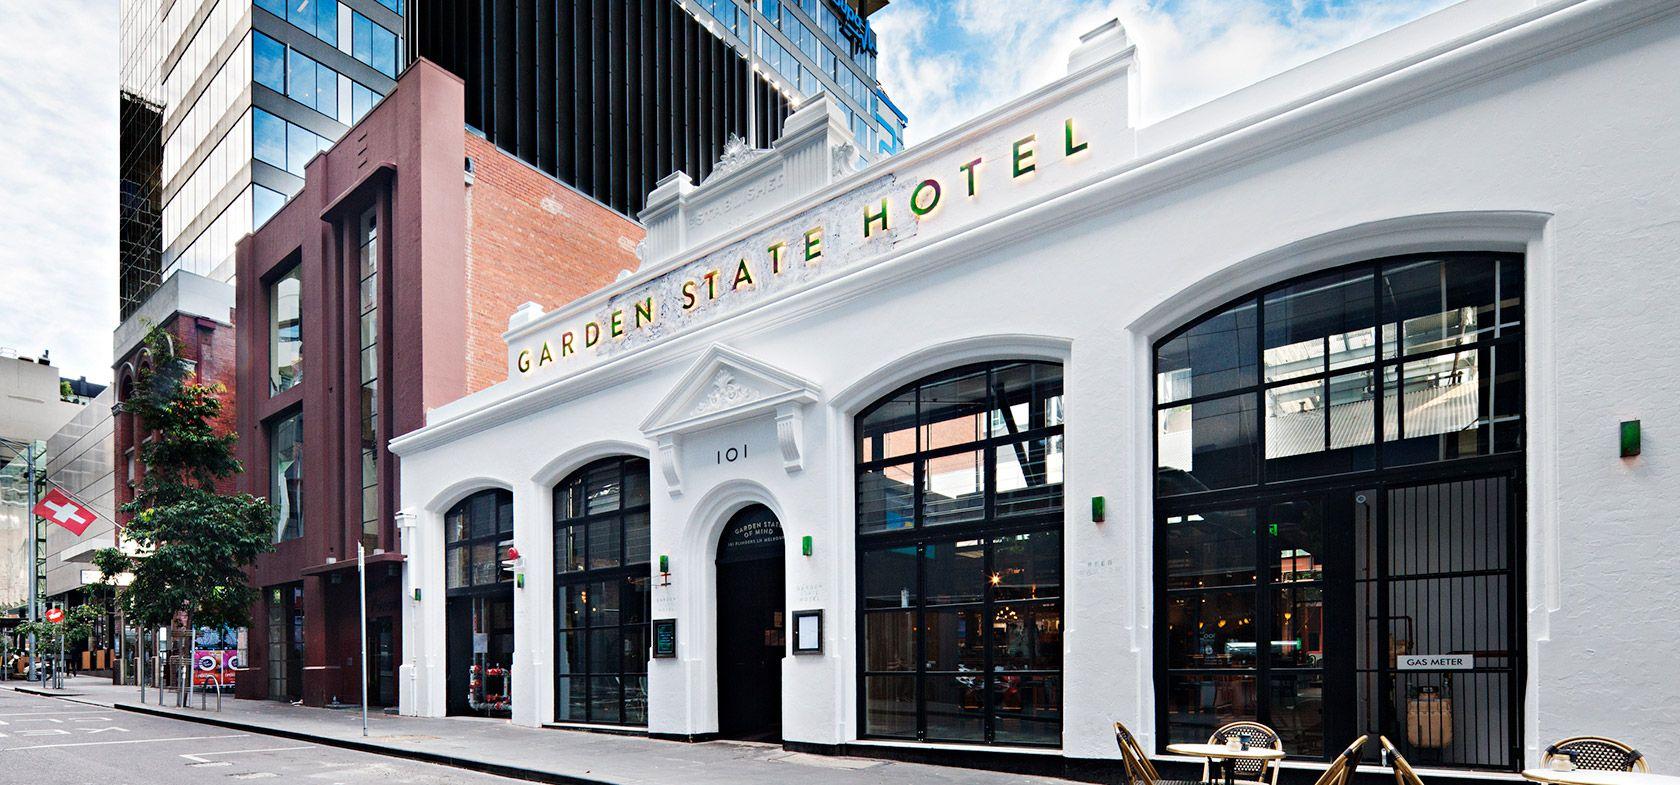 Garden State Hotel White Exterior Building Facade Flinders Lane Melbourne